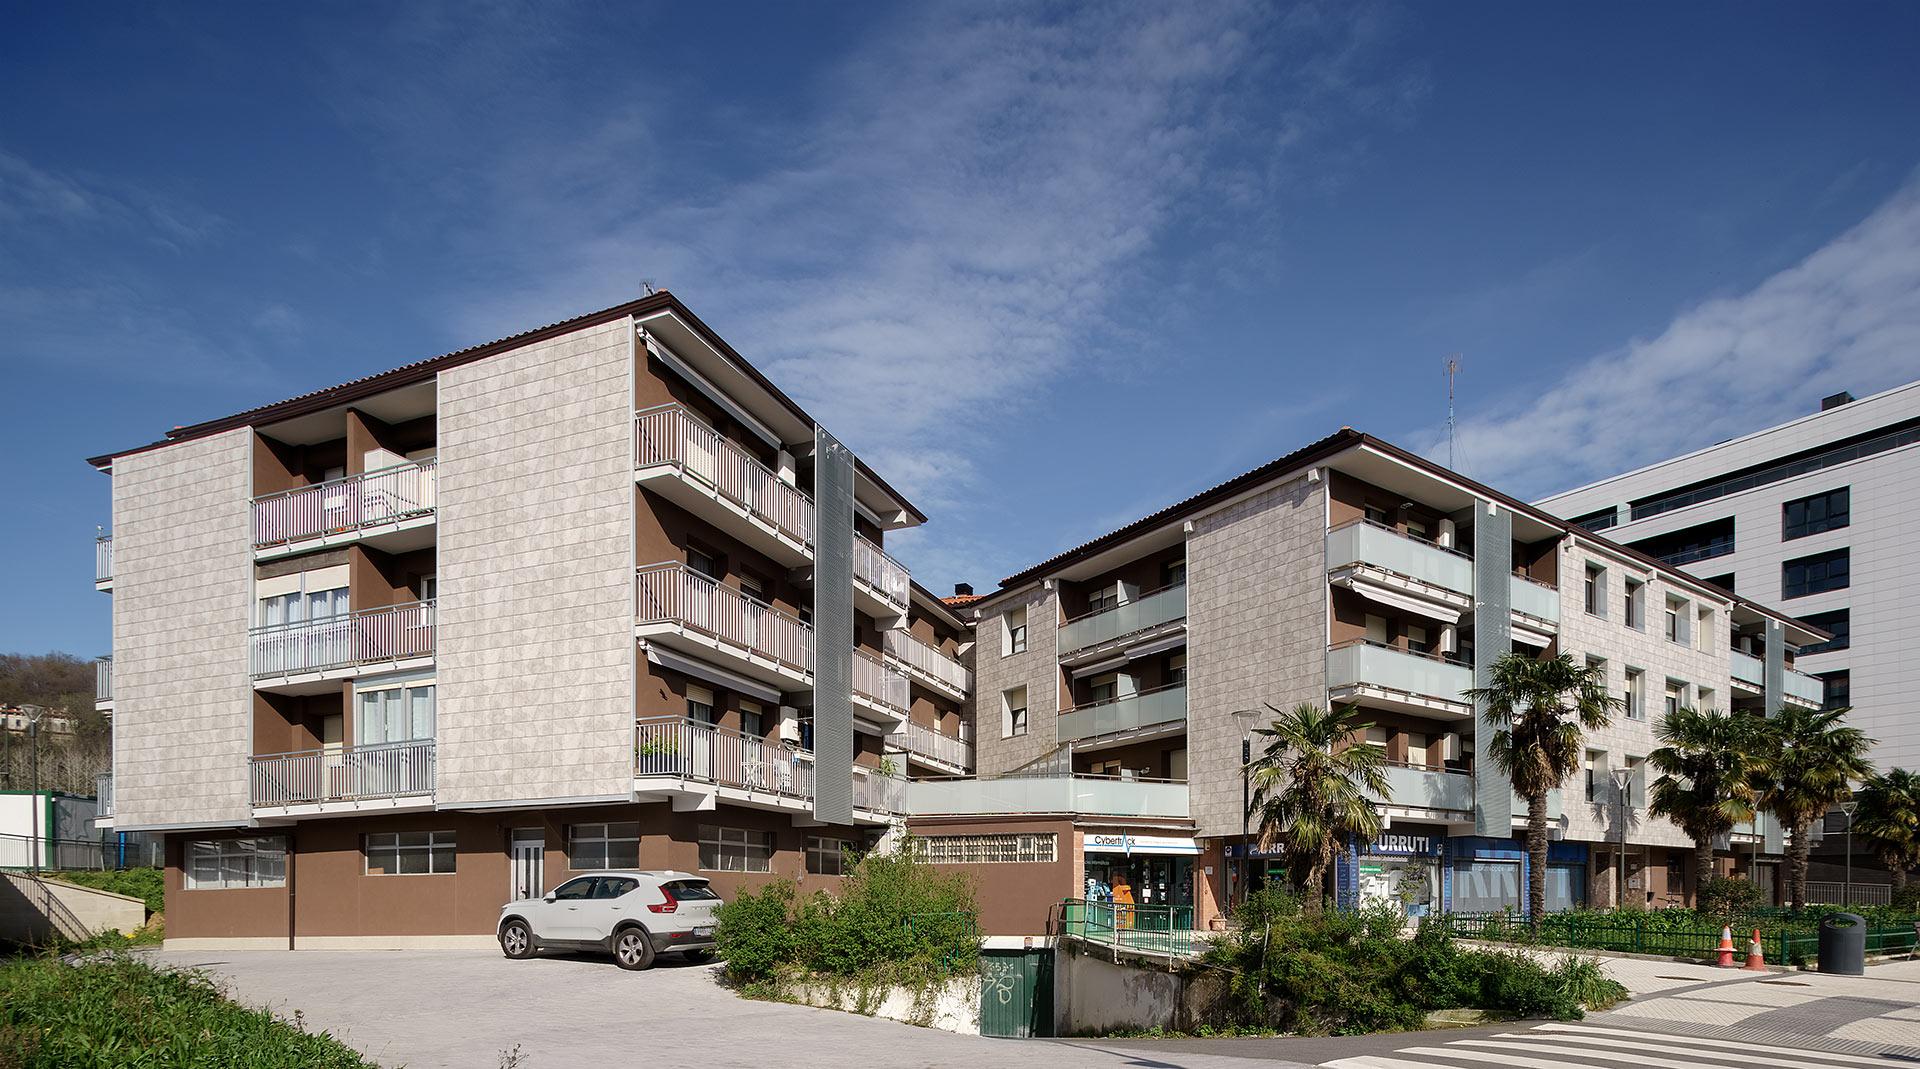 Rehabilitacion-energetica-fachada_aislamiento_District-Heating_BASA-Arquitectura_San-Sebastian-Donosti_4_b